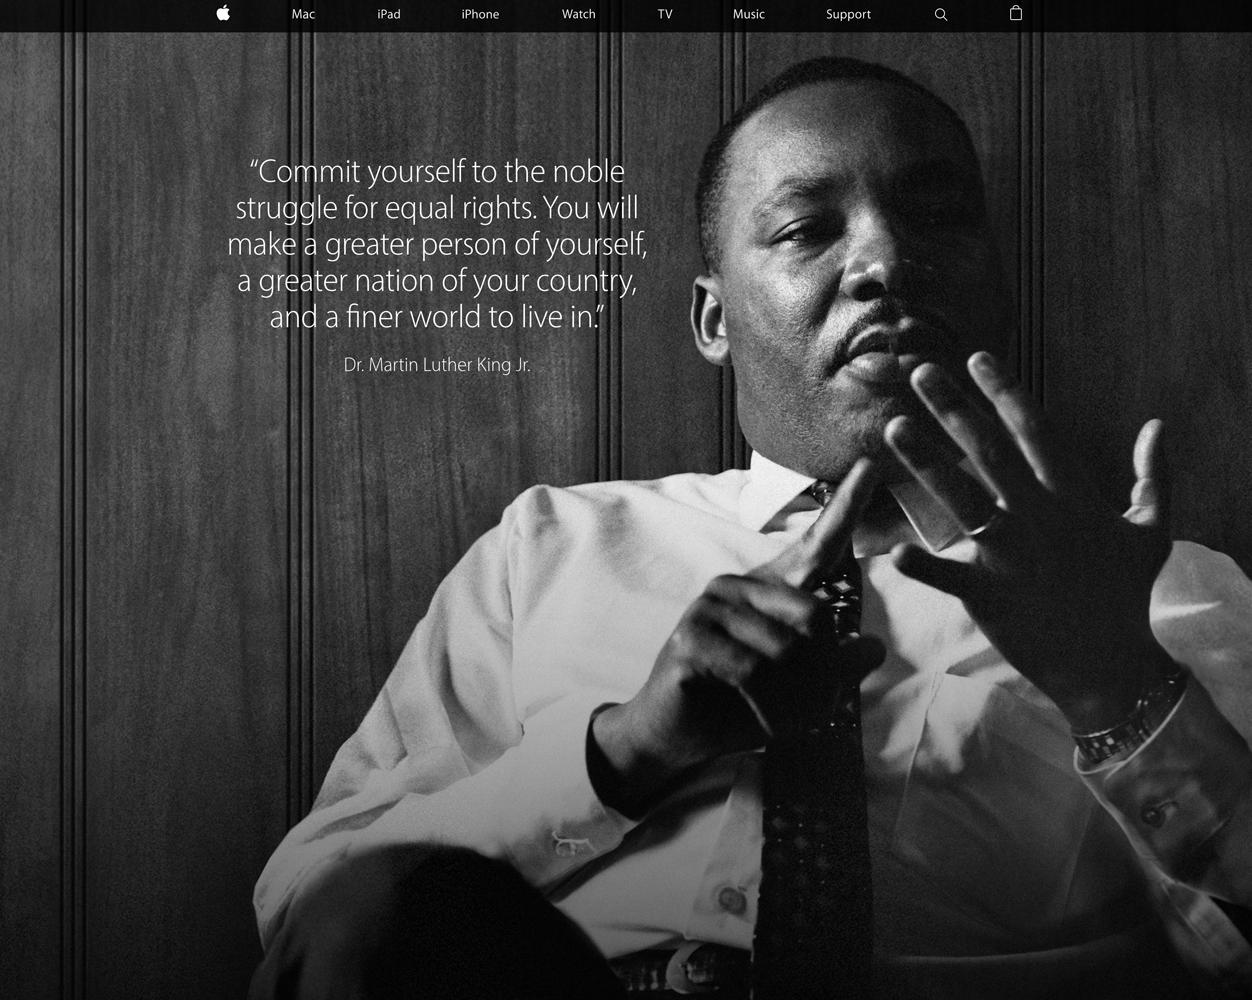 Apple、「マーチン・ルーサー・キング・ジュニア・デー」に合わせてトップページをキング牧師の写真に変更